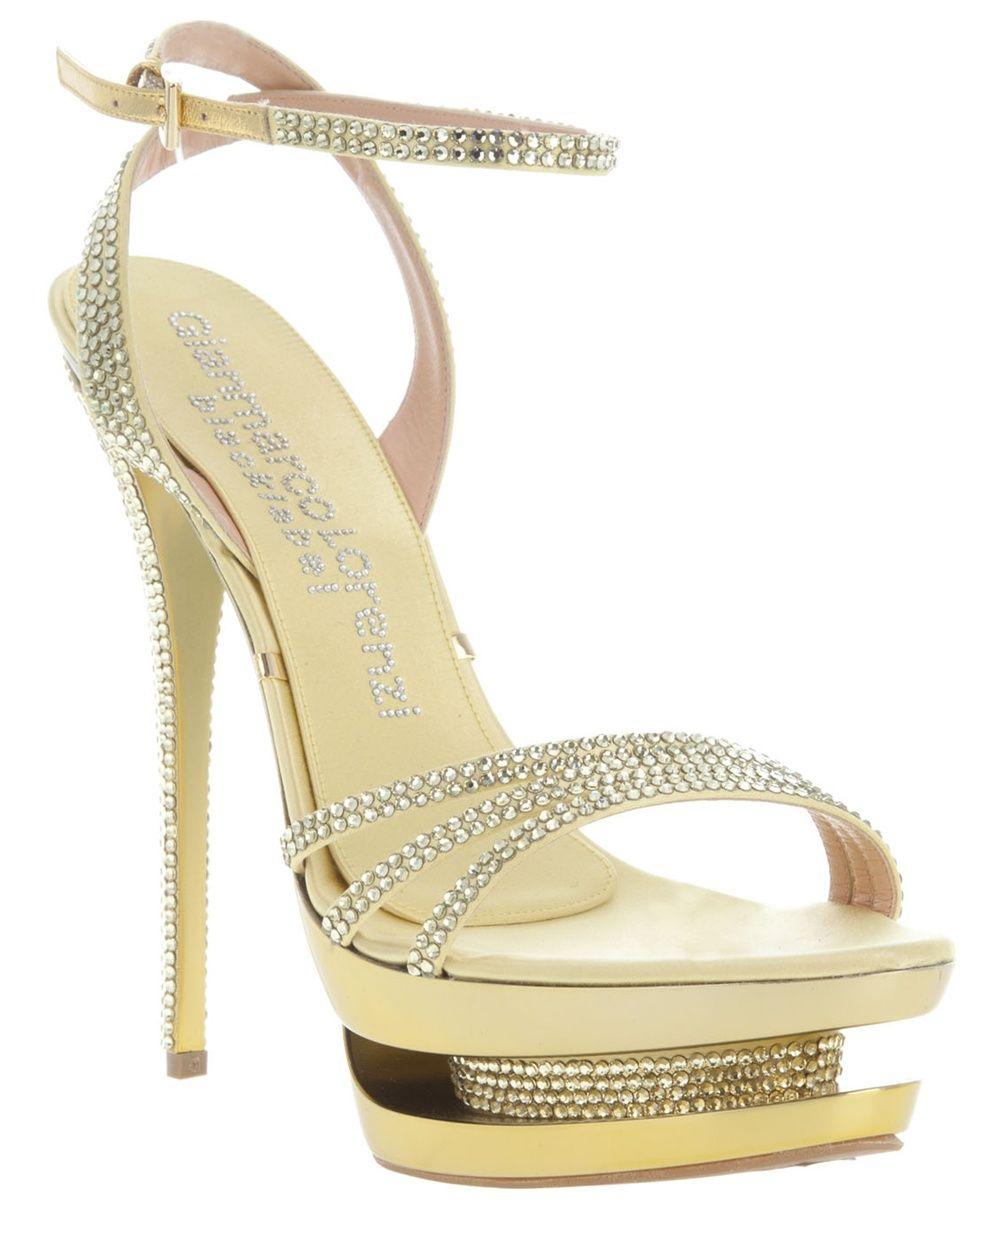 rhinestone platform sandals by gianmarco lorenzi shoes shoes shoes rh pinterest com